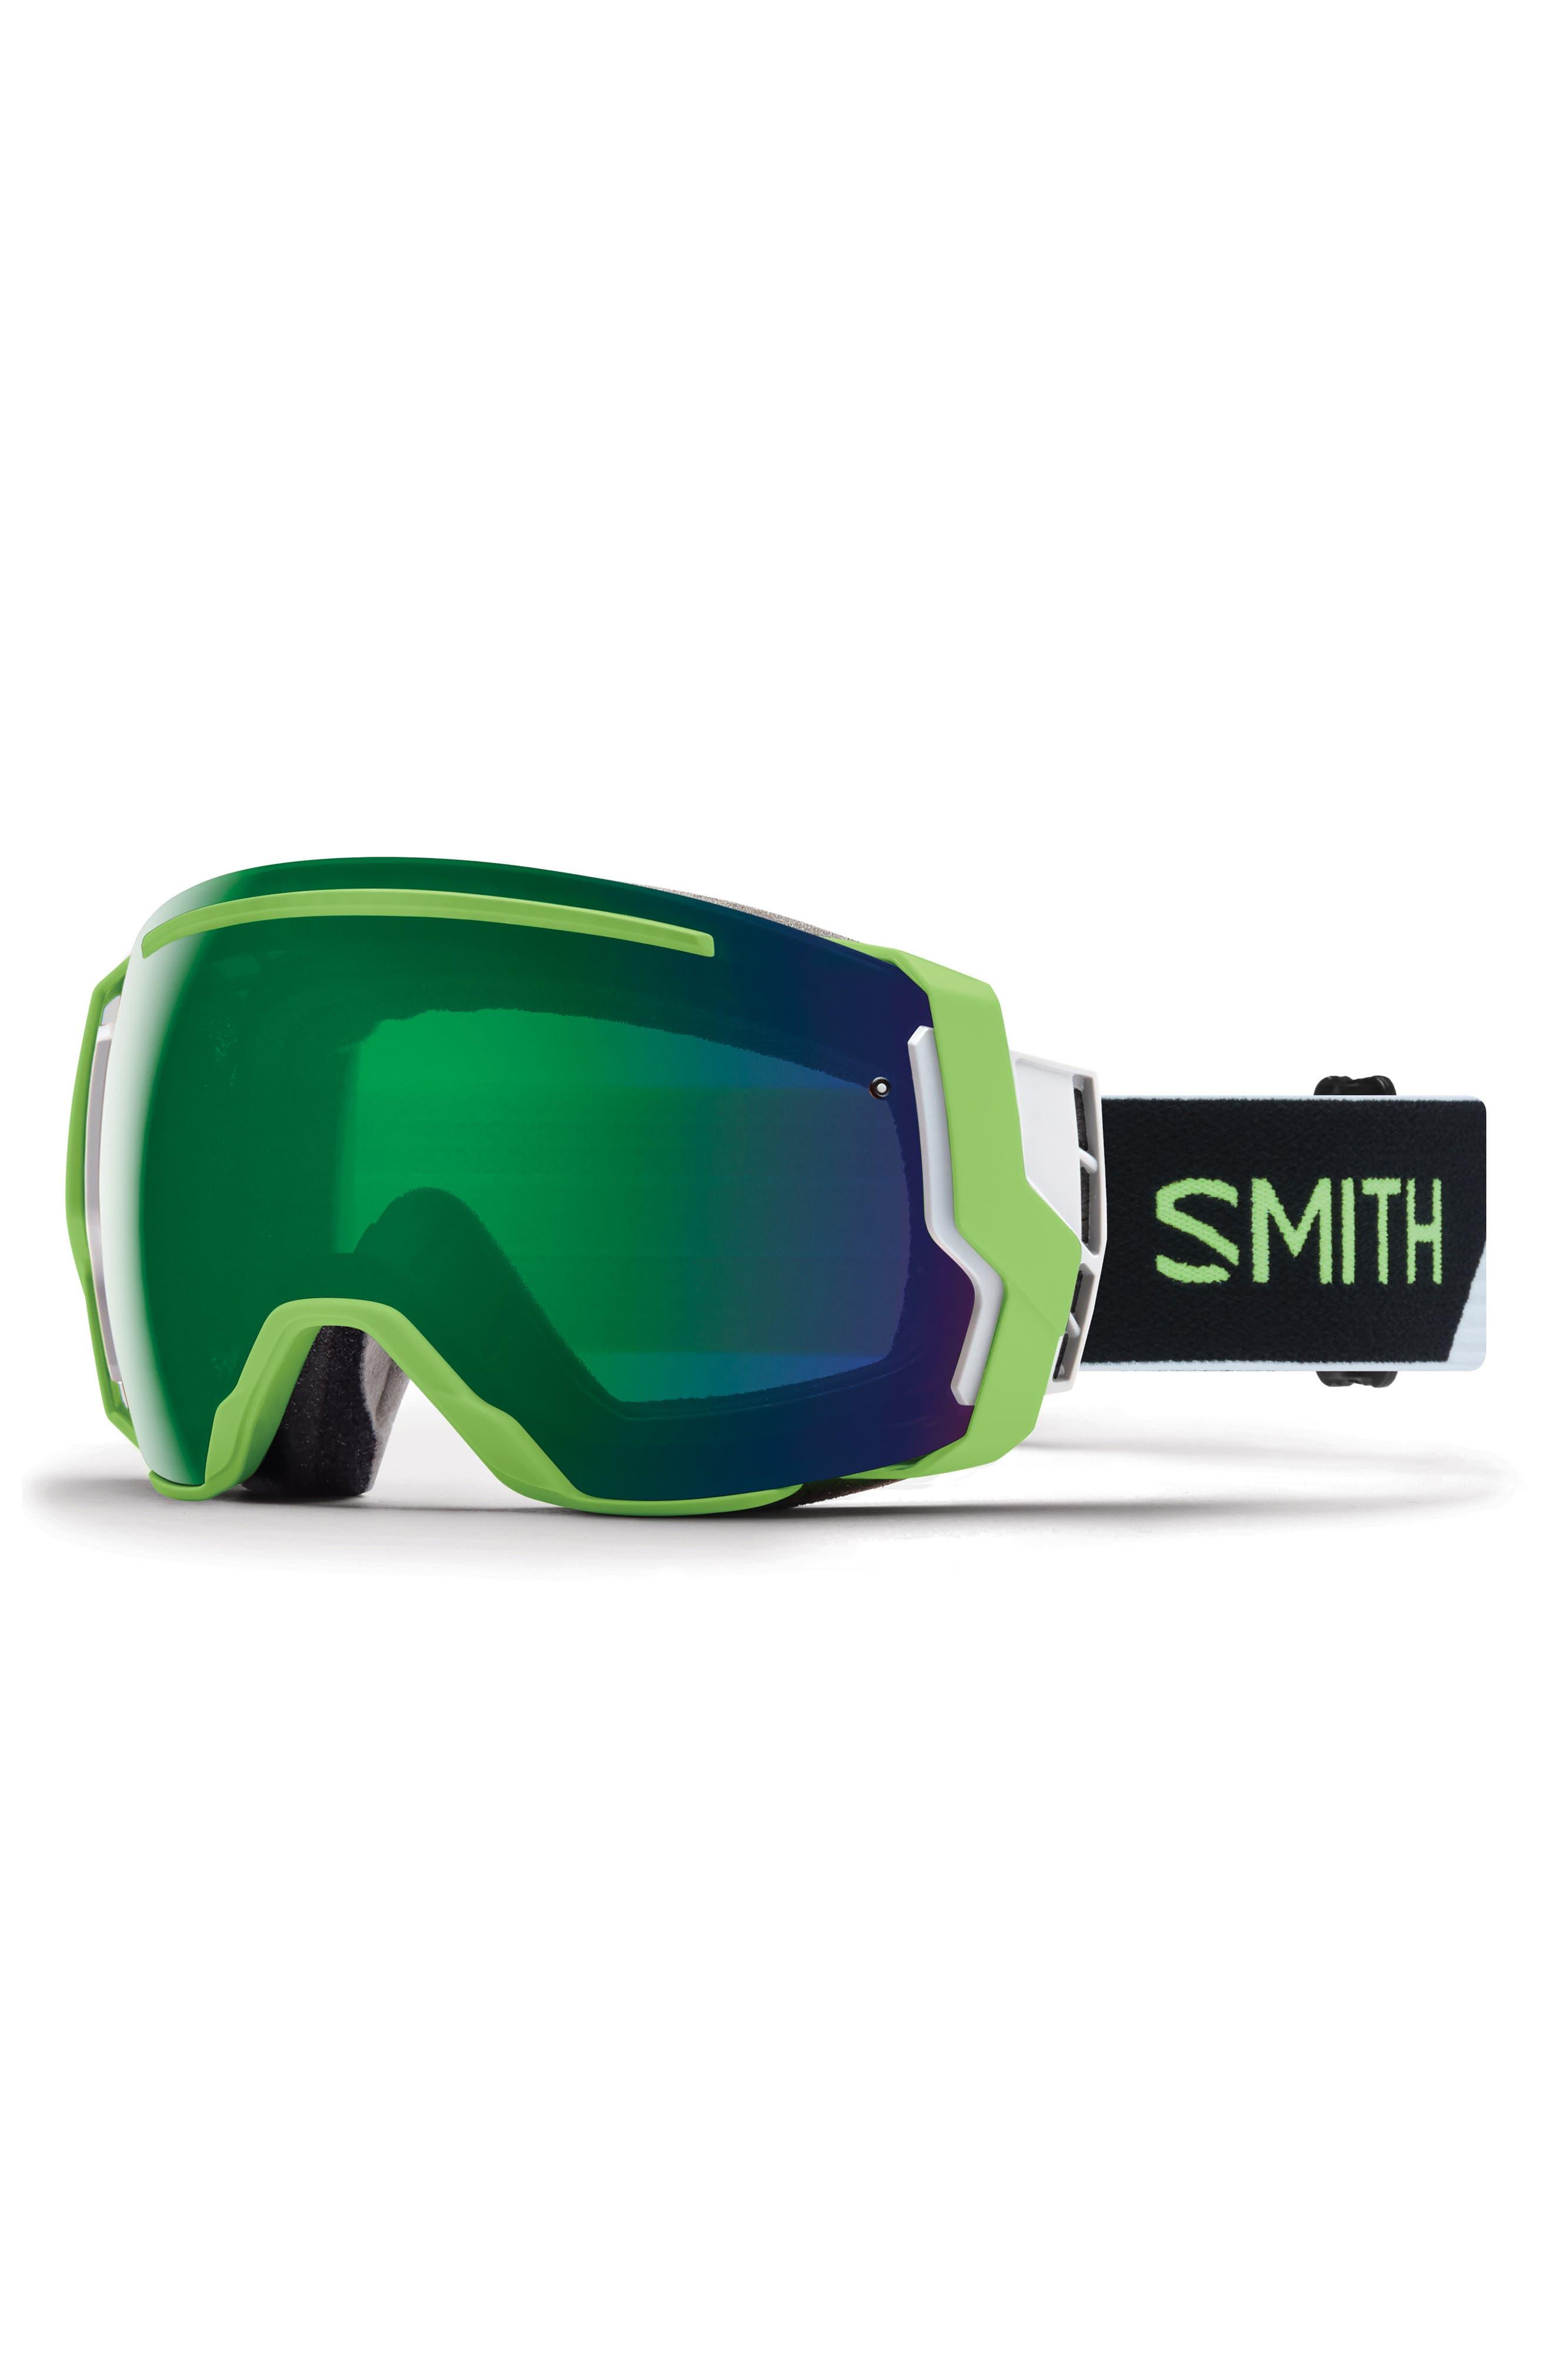 Main Image - Smith I/O7 Chromapop 185mm Snow Goggles